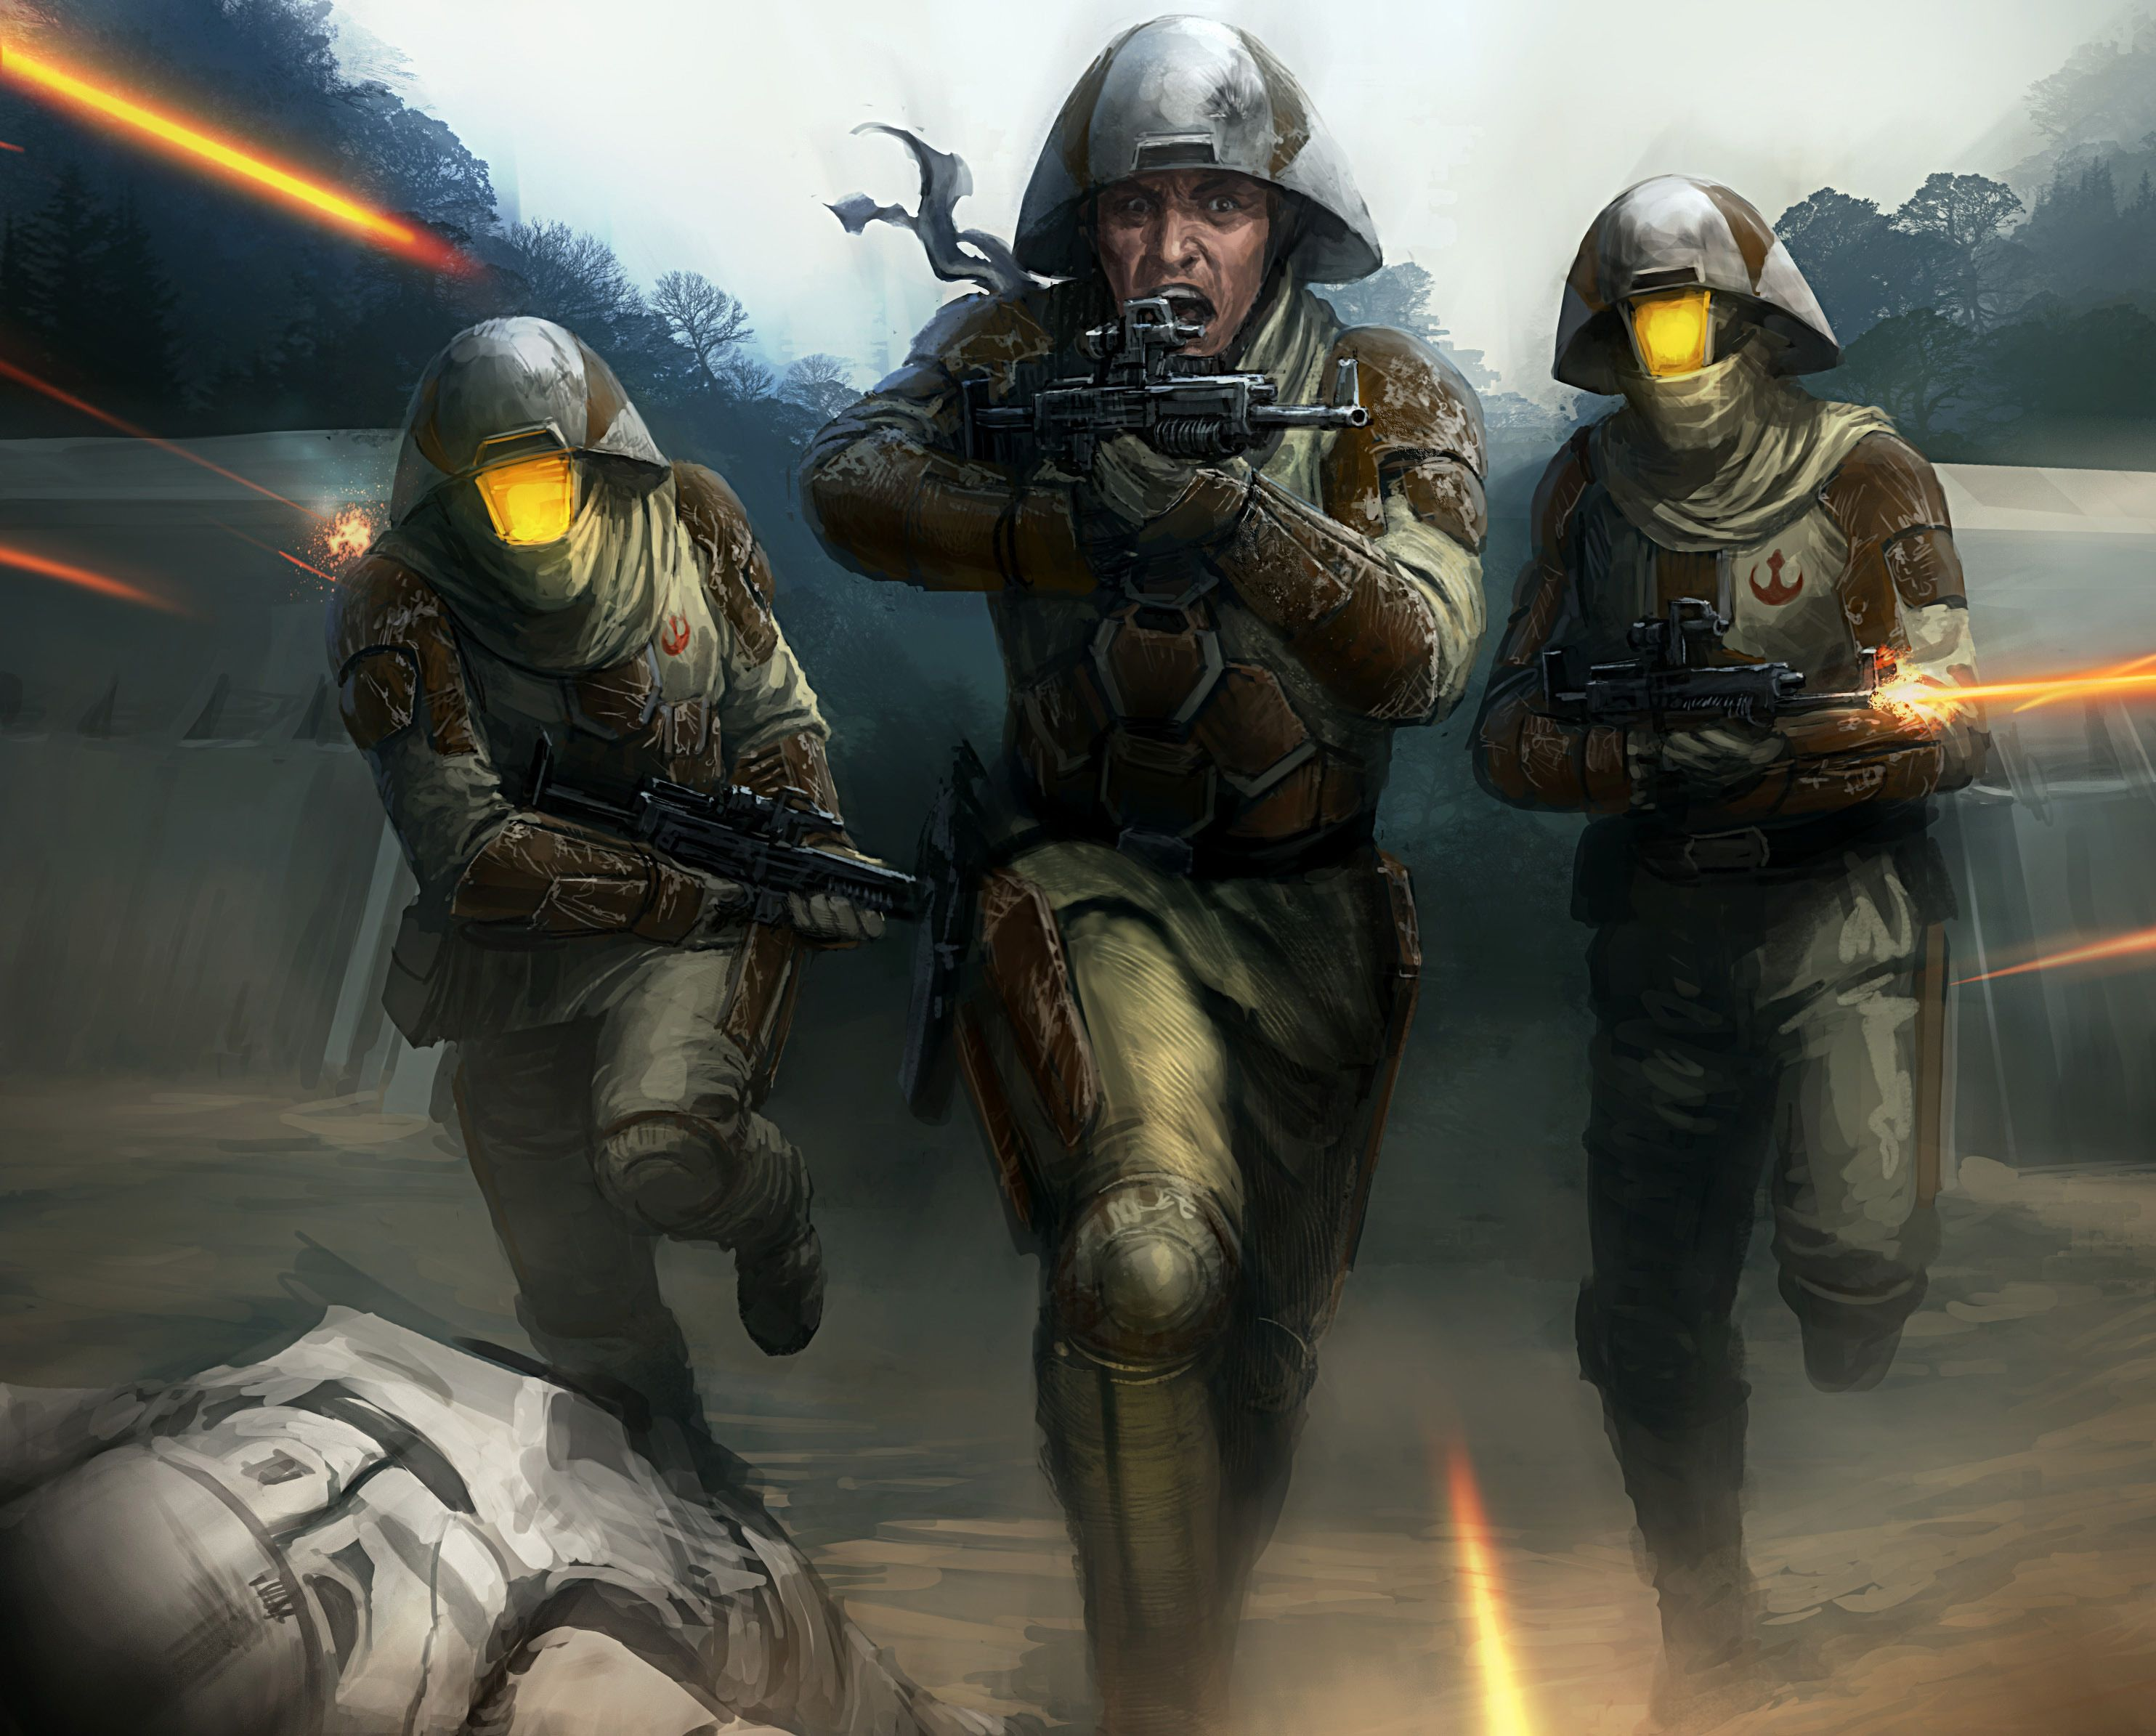 Rebel Soldier Wallpapers Top Free Rebel Soldier Backgrounds Wallpaperaccess